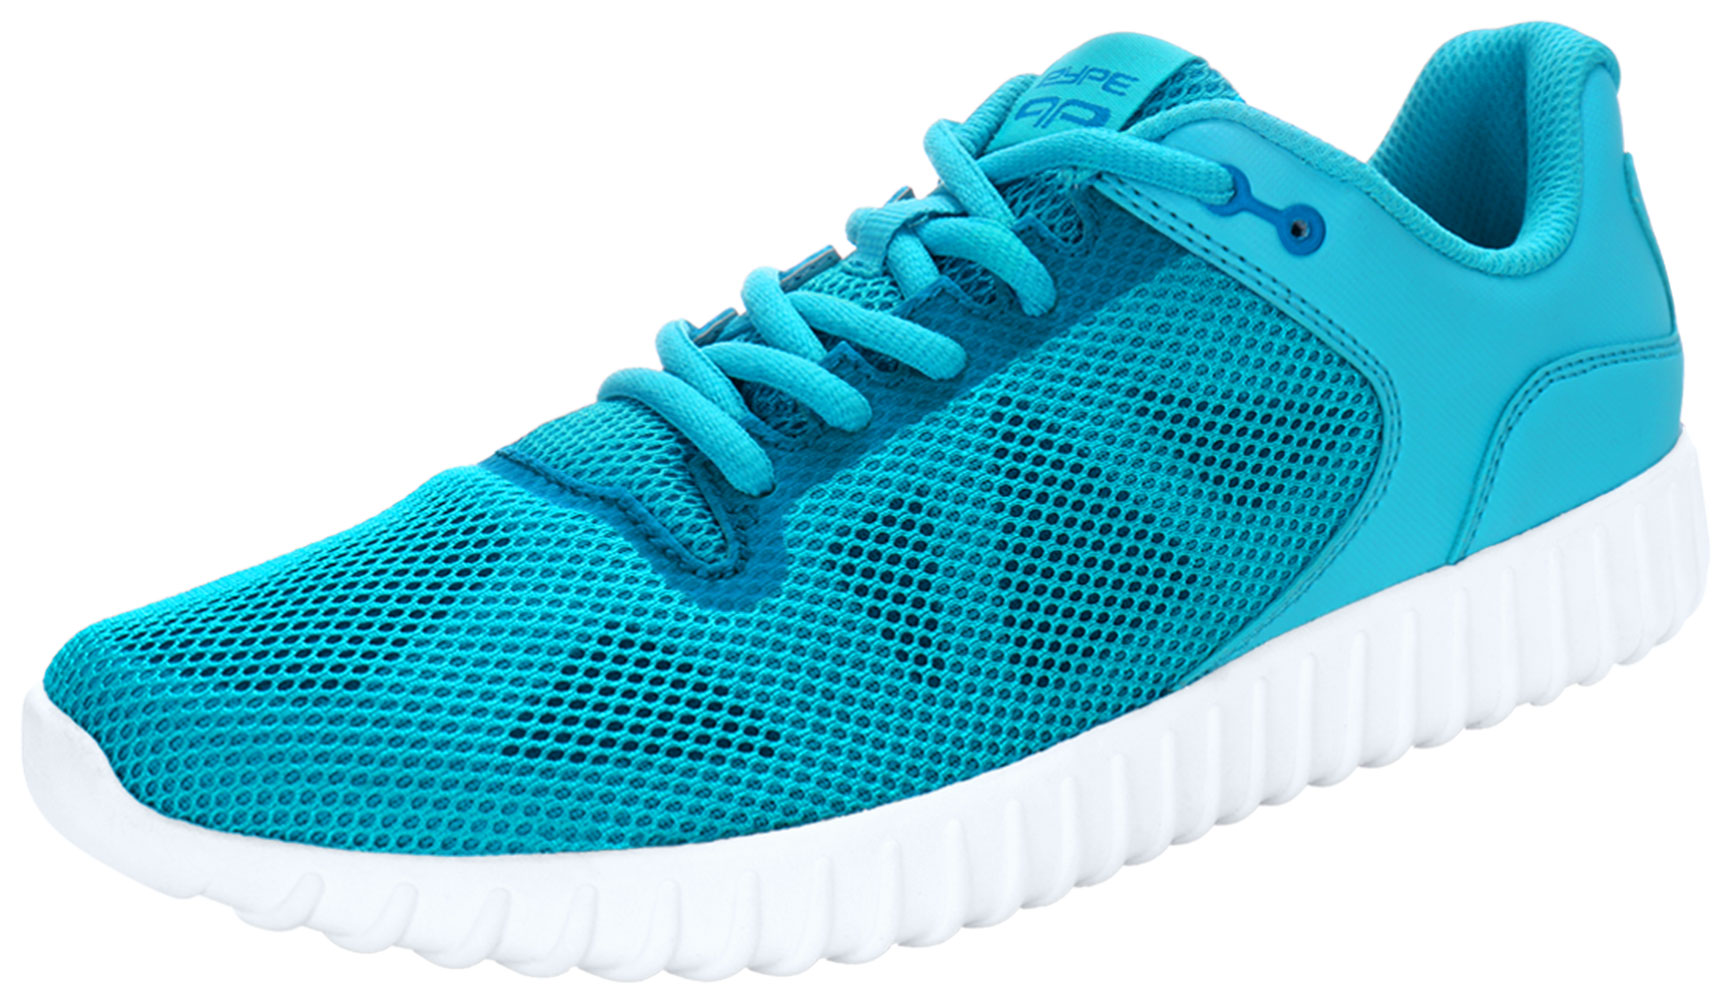 PYPE Women Geometric Prints Lace Up Mesh Training Shoes Blue US 9